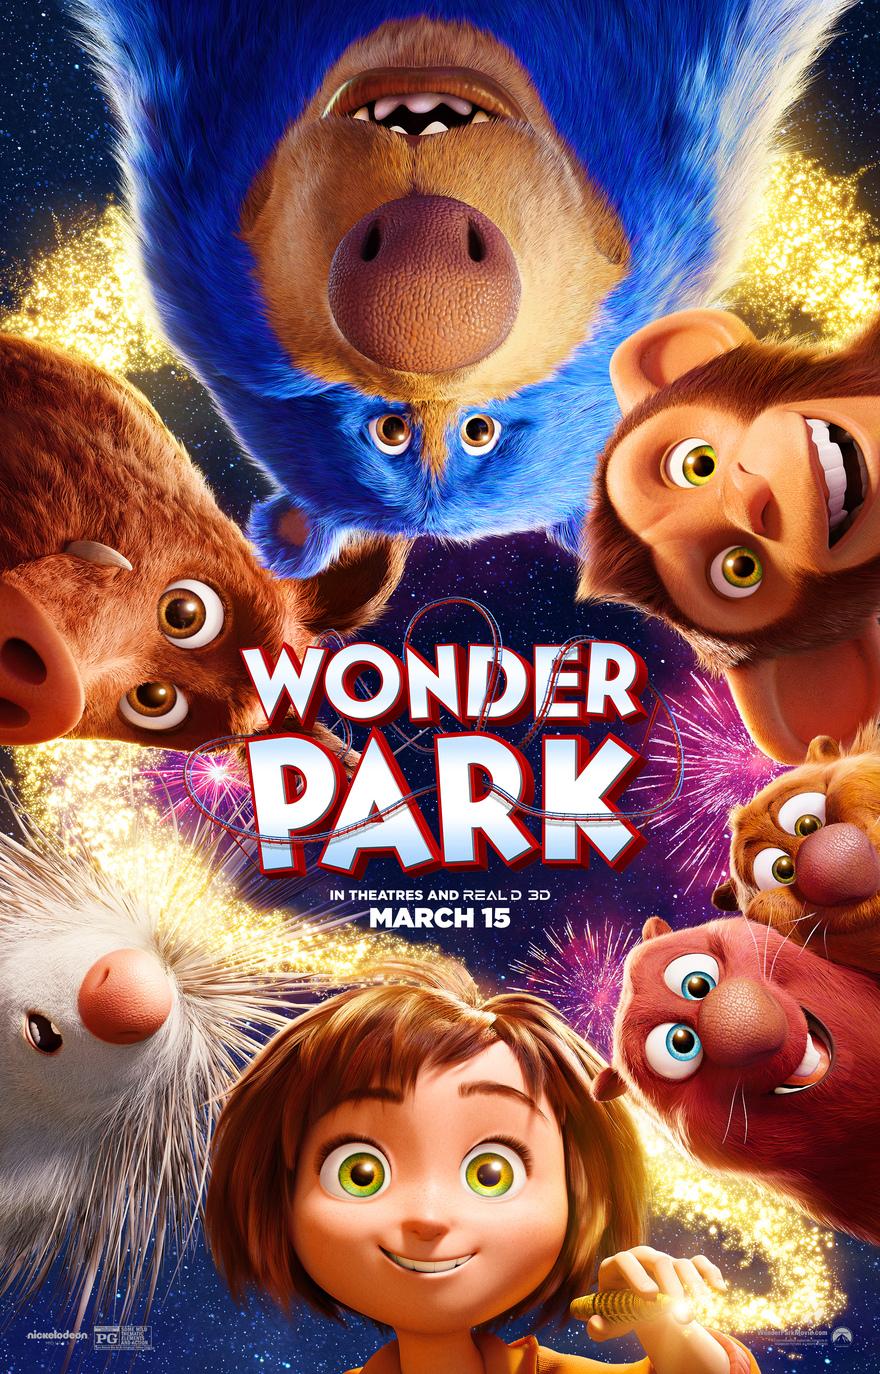 Wonder Park trailer